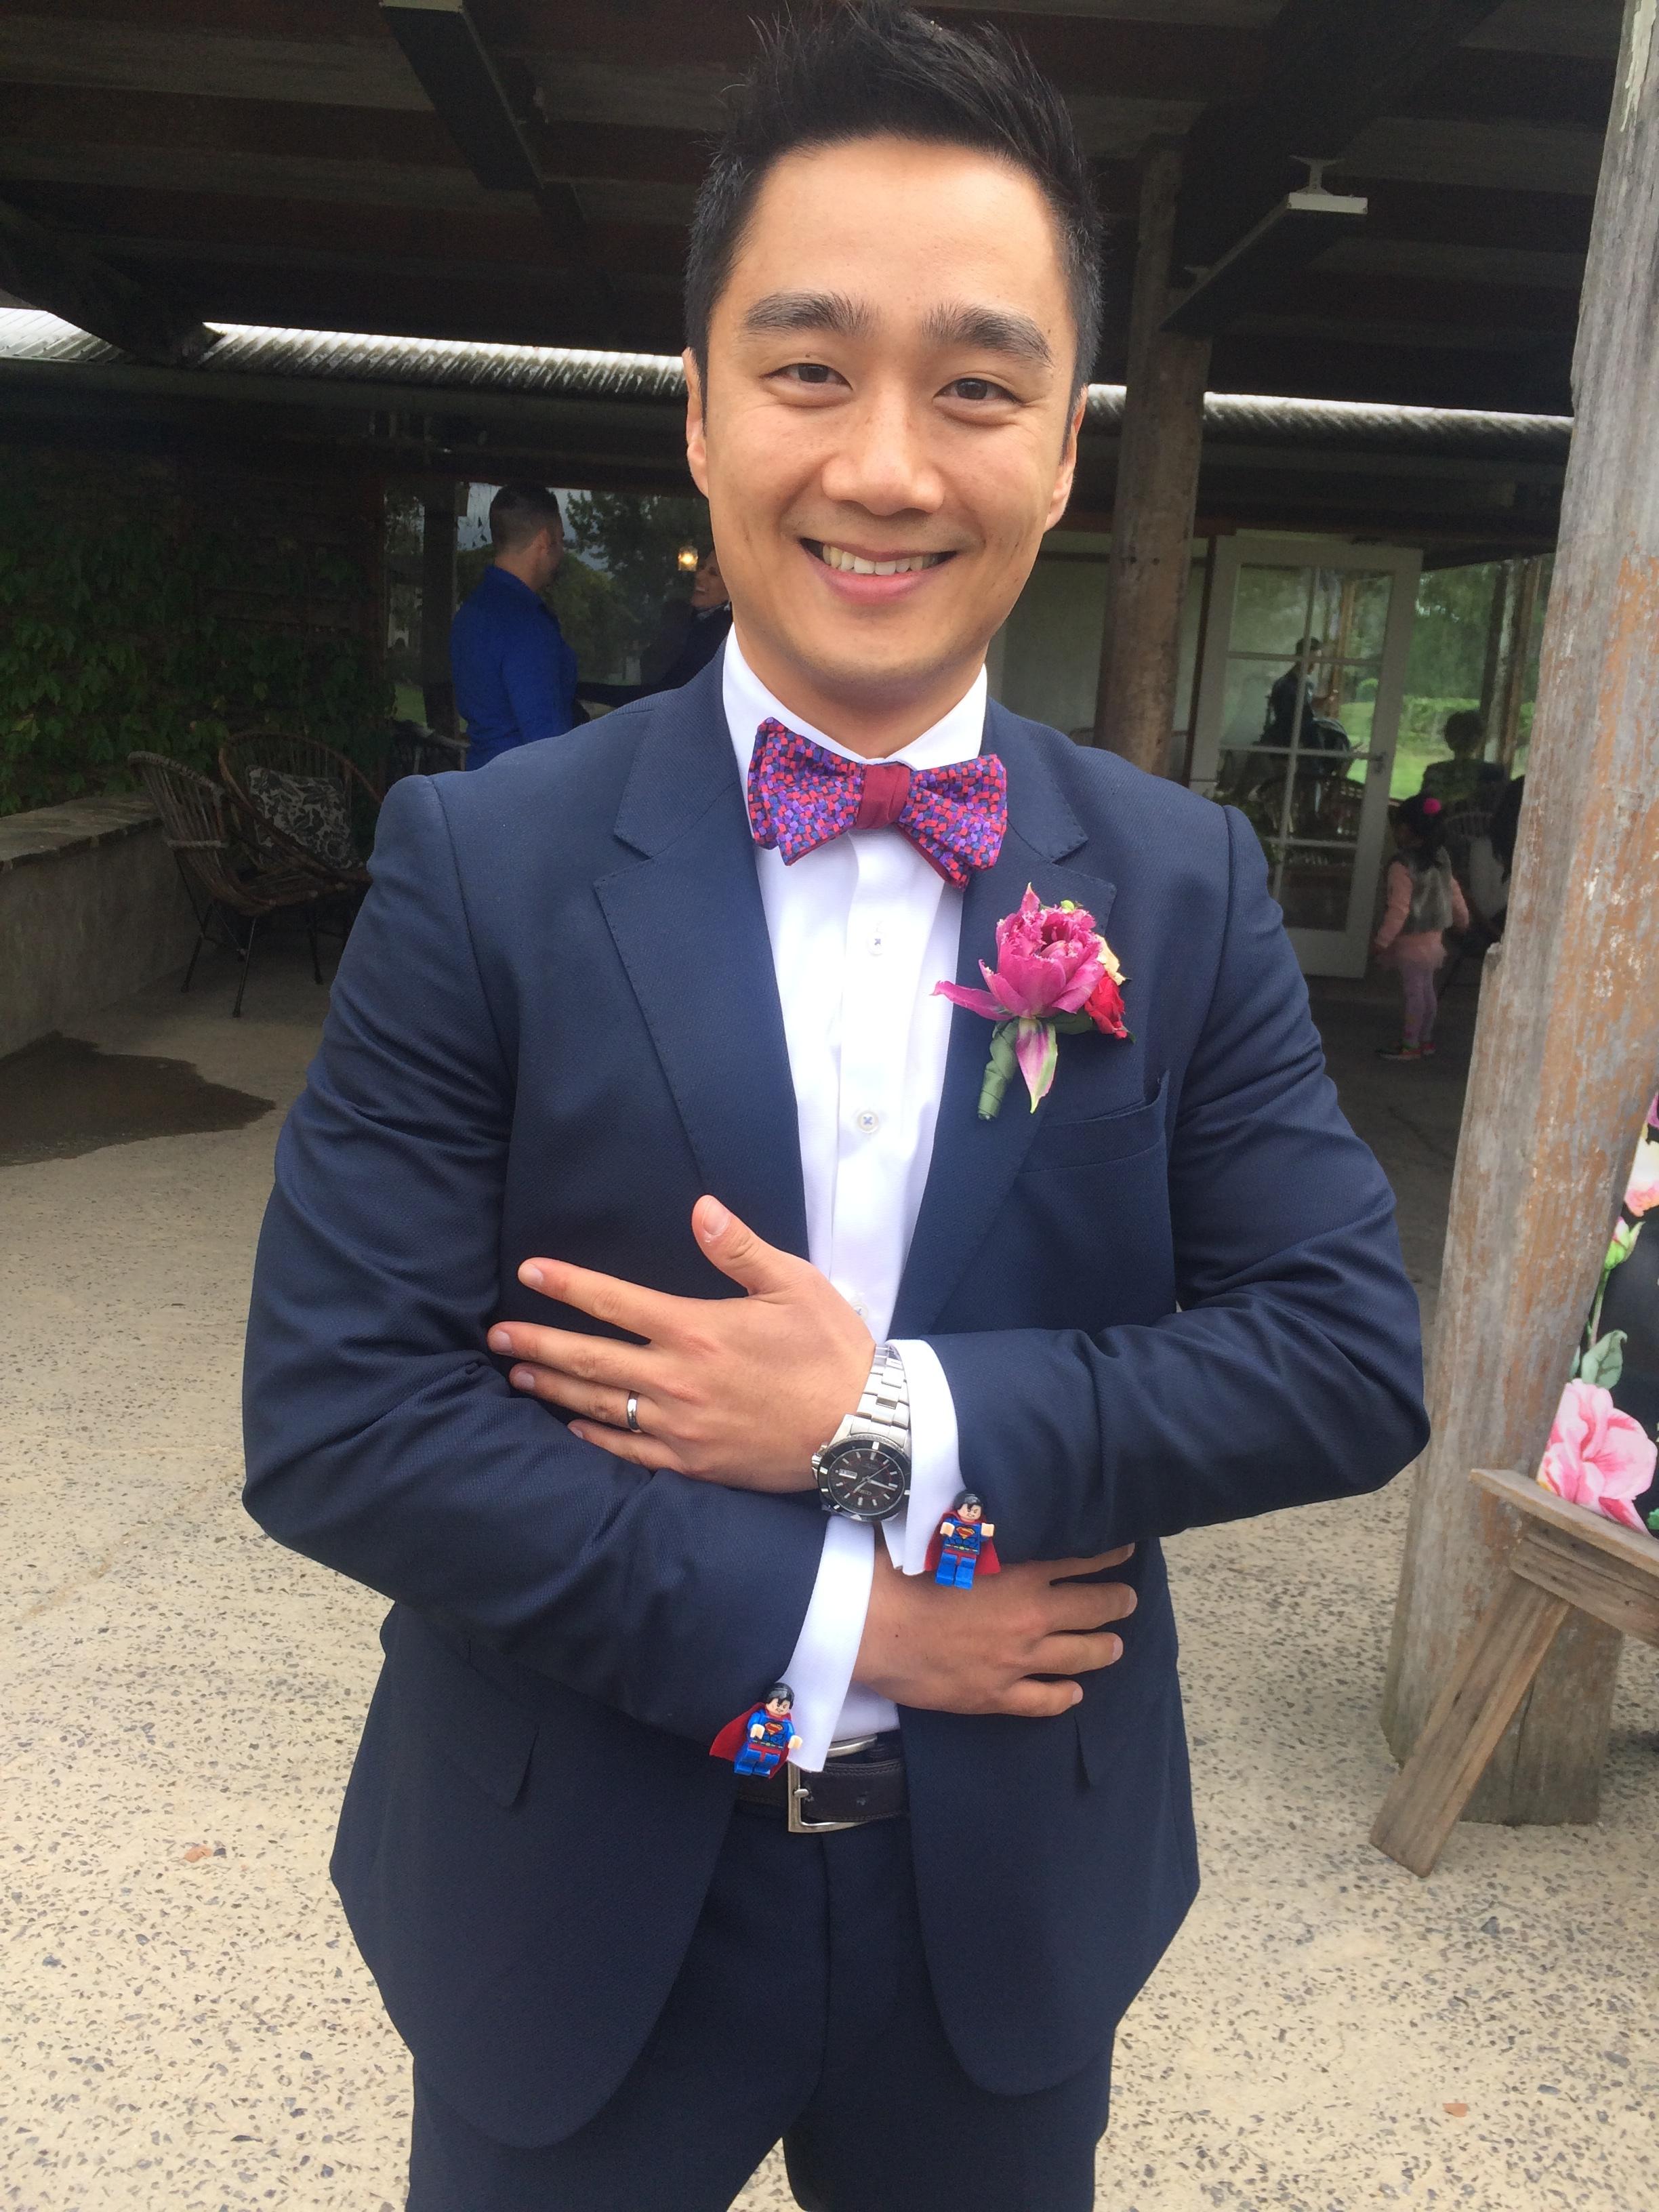 edward kwan bow tie.JPG